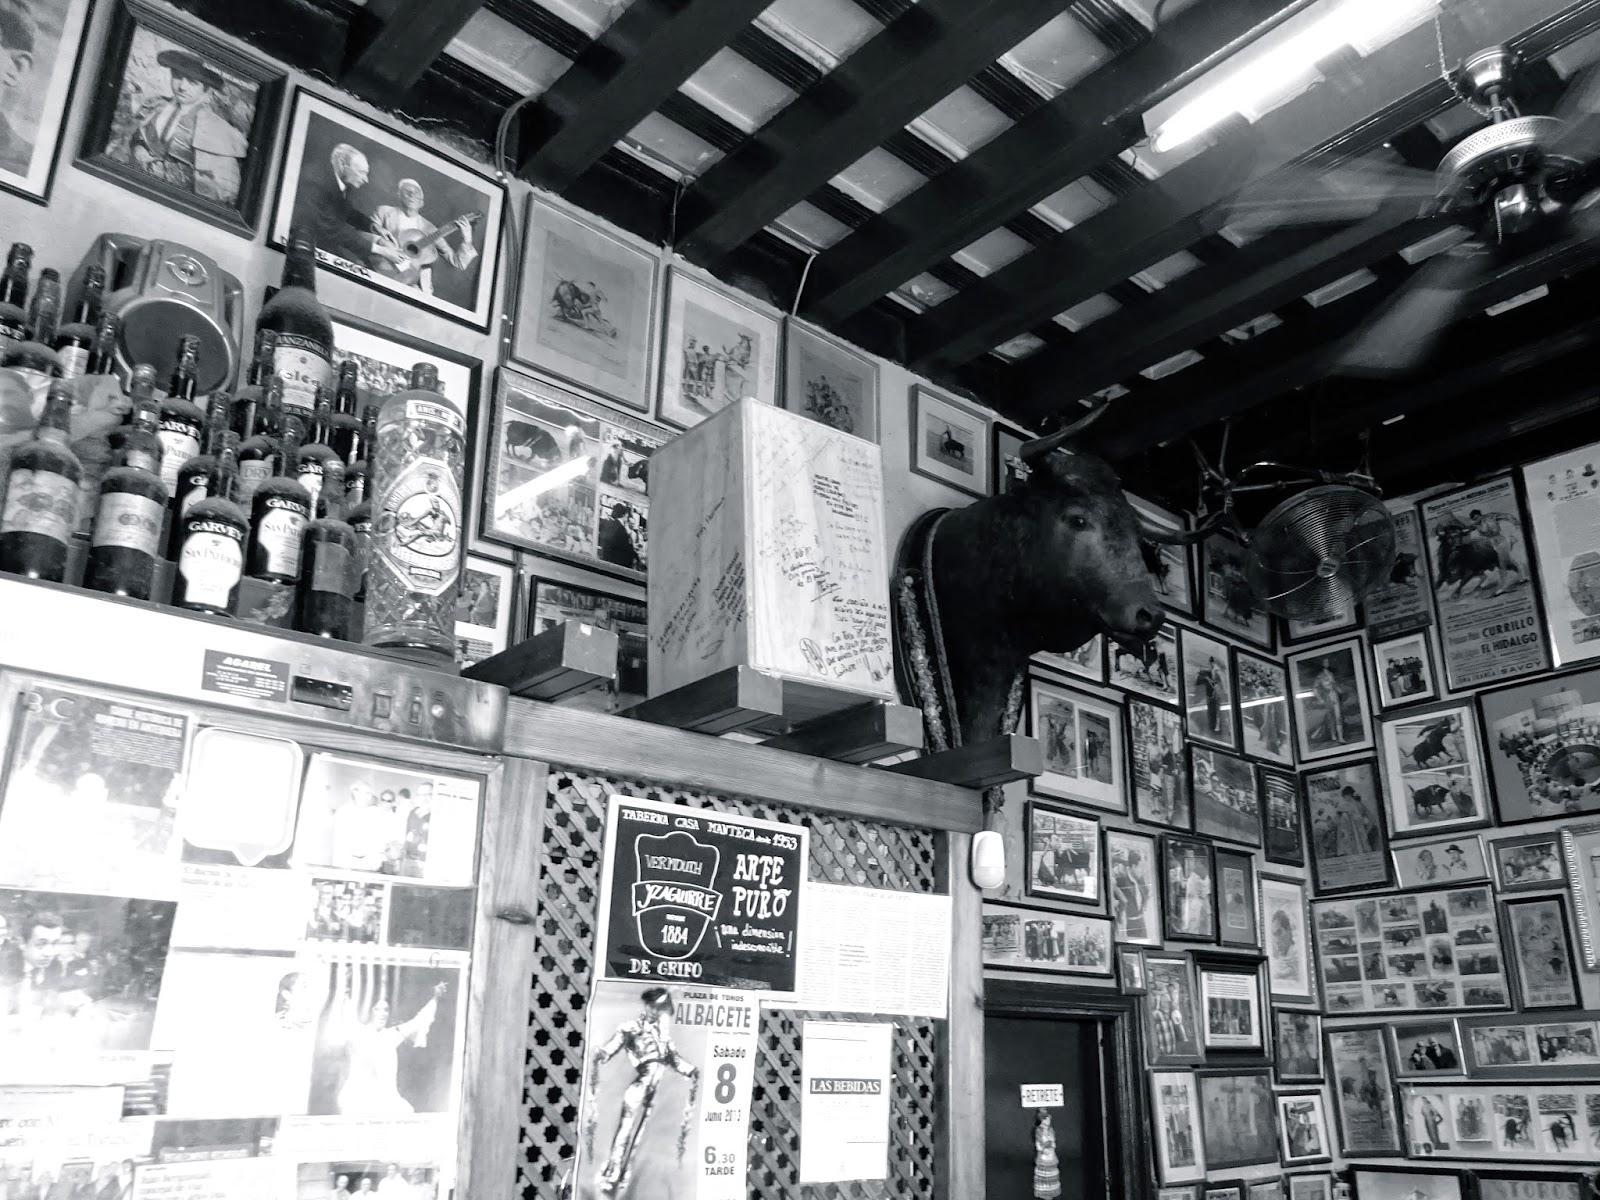 Casa Manteca, cadiz, bar de tapas, taurino, mejor bar de tapas cadiz, estamotendenciados, mojama, jamón, chicharron, andalucía, verano, restaurante cádiz